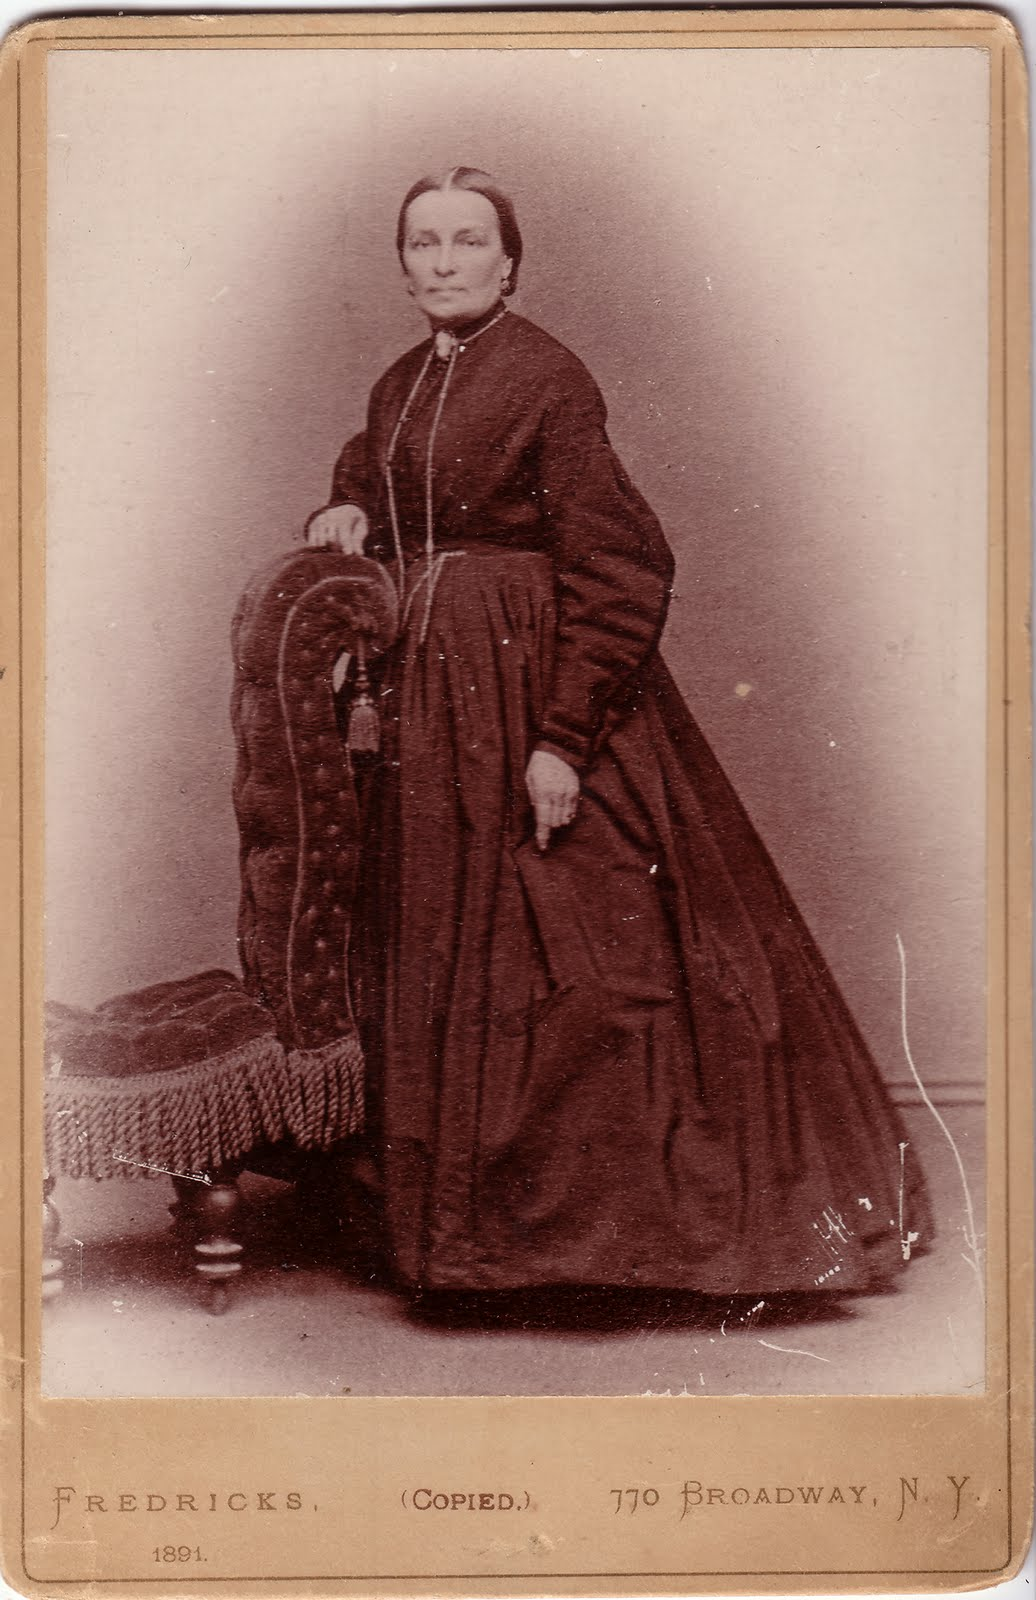 http://2.bp.blogspot.com/_1yxS-am2HNE/S_zu7EqbZoI/AAAAAAAAHGM/EZoHgADjcyc/s1600/Weber-Sophia_1815-1891_front_large_2a.jpg